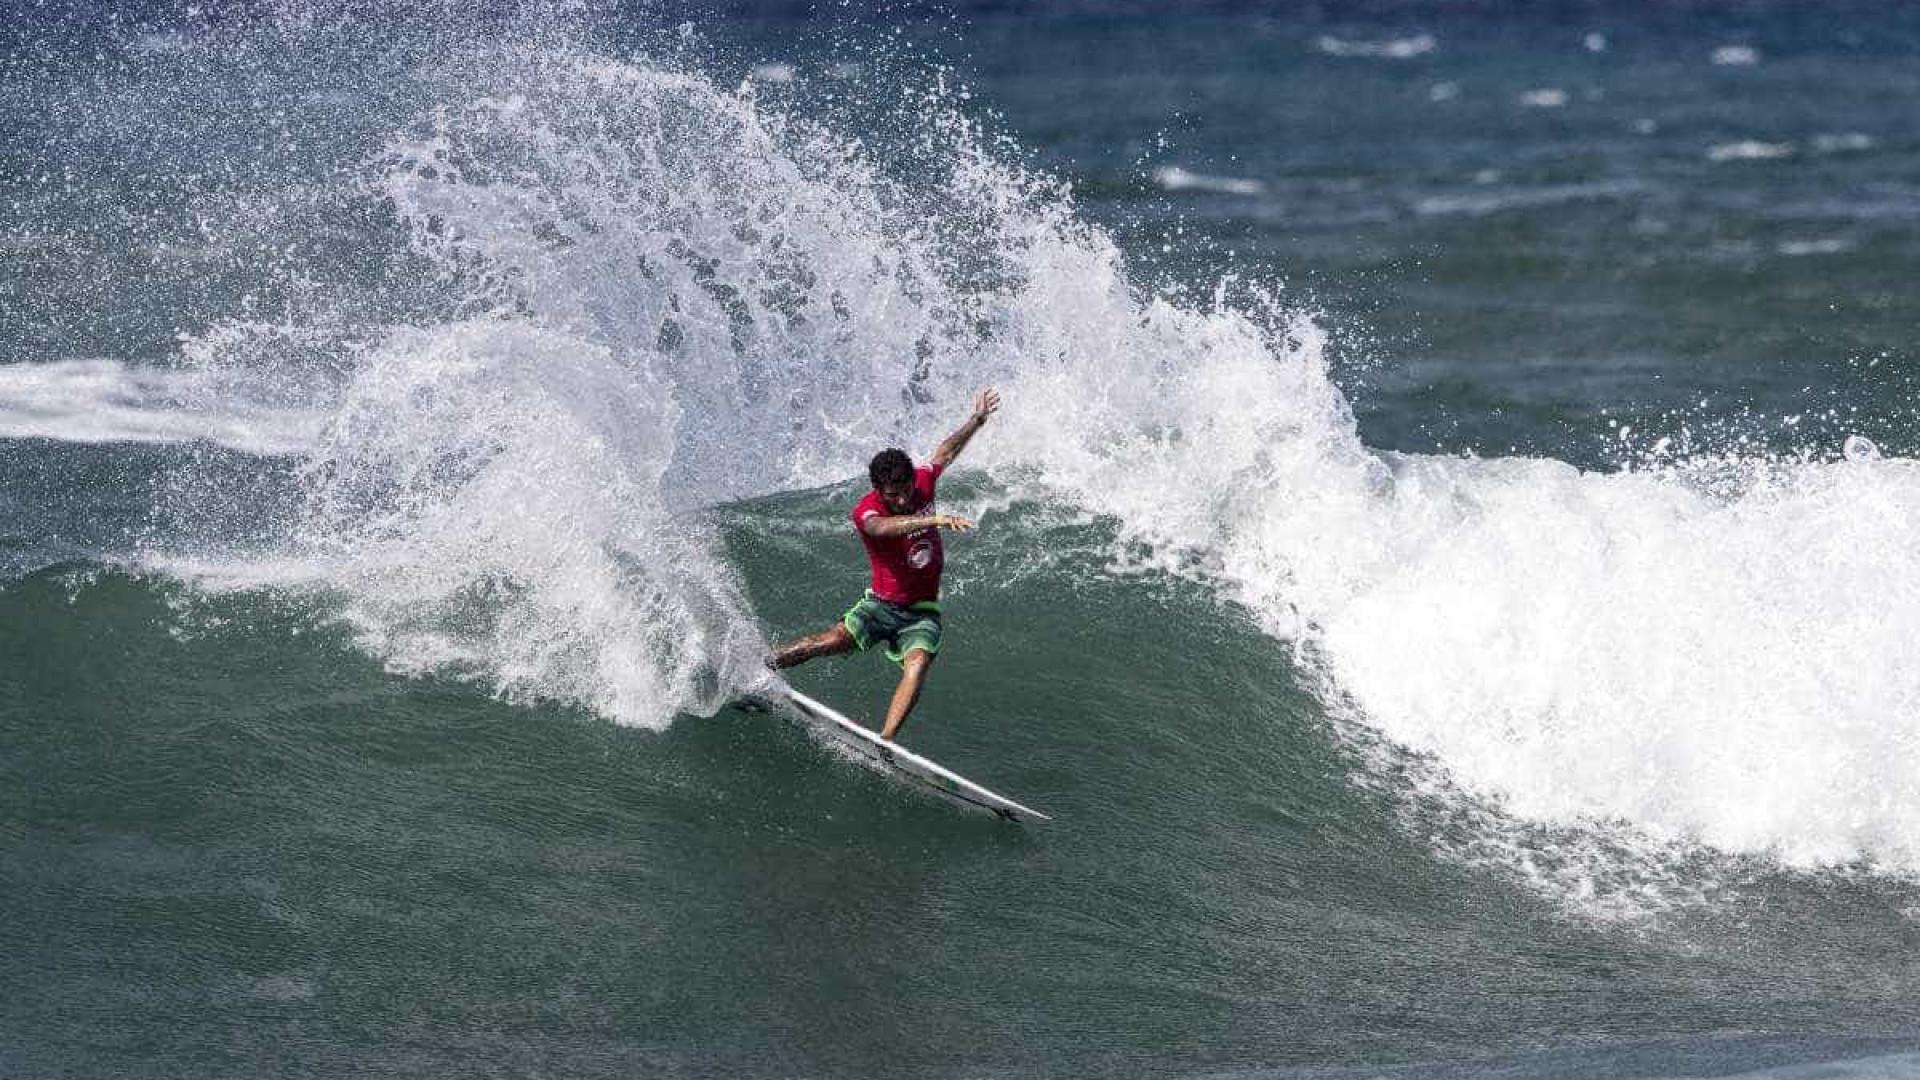 Filipe Toledo vence o primeiro desafio da Tríplice Coroa Havaiana